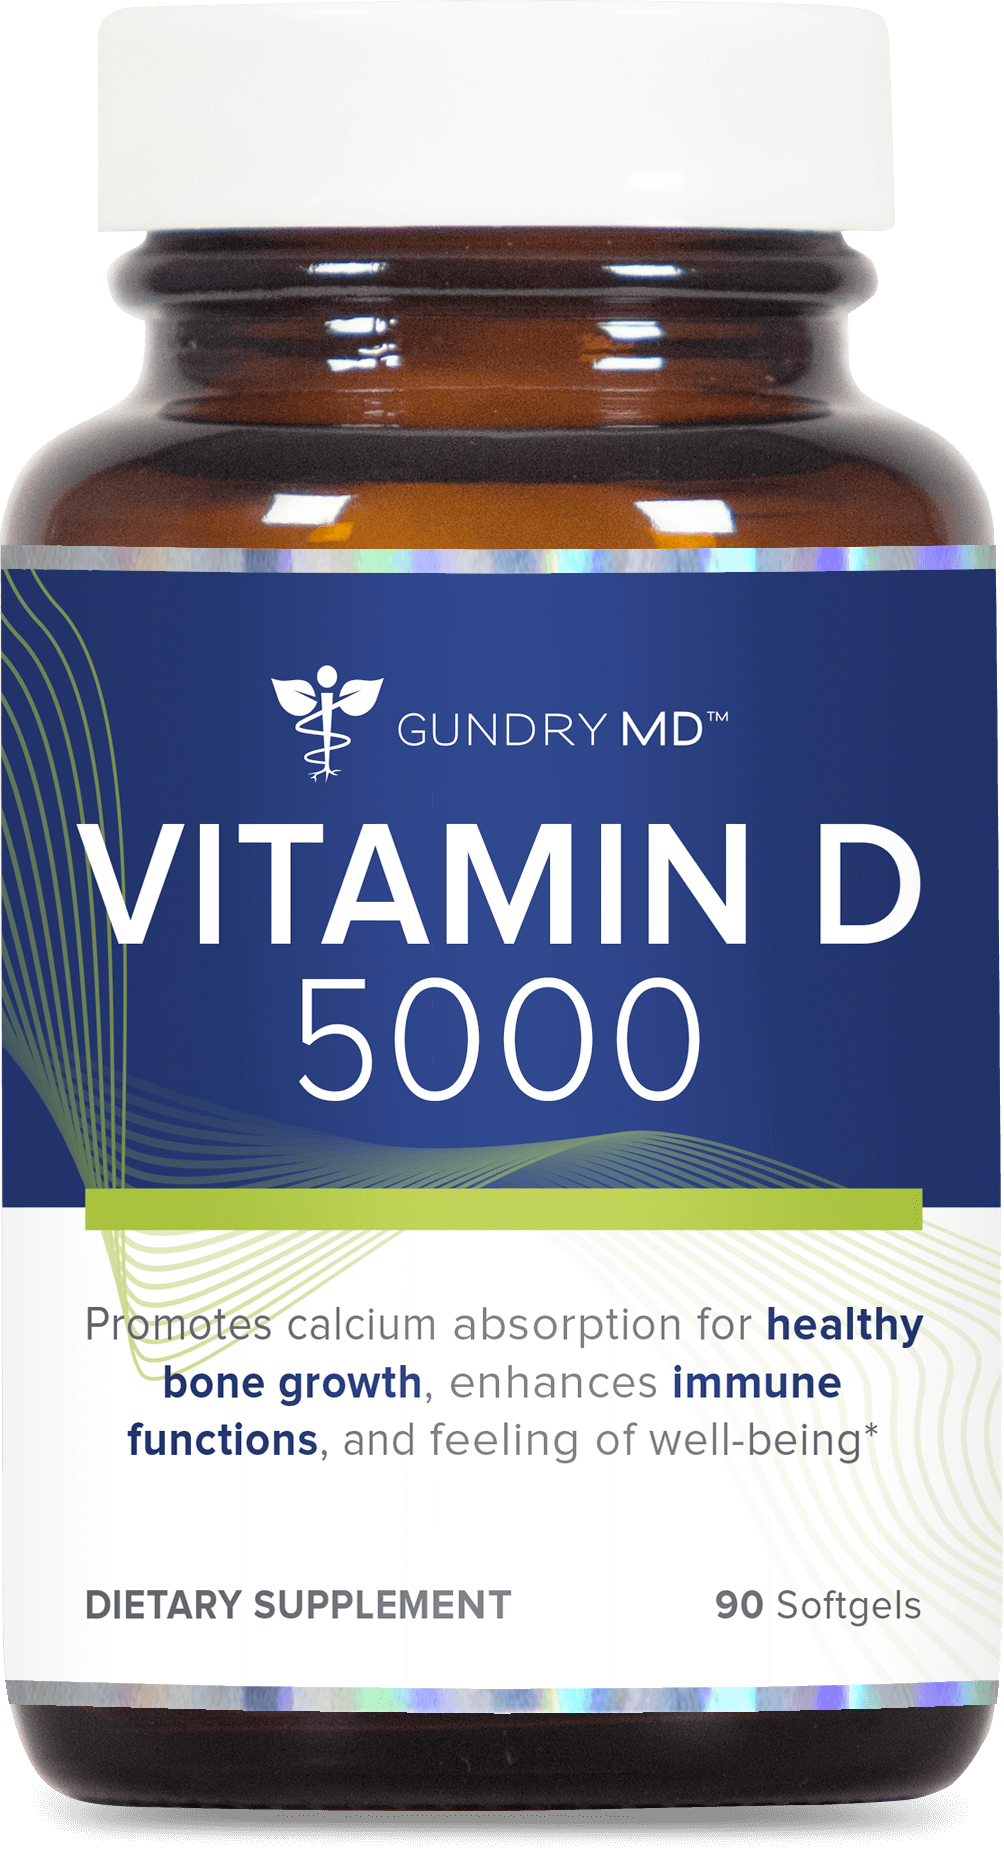 Vitamin D 5000